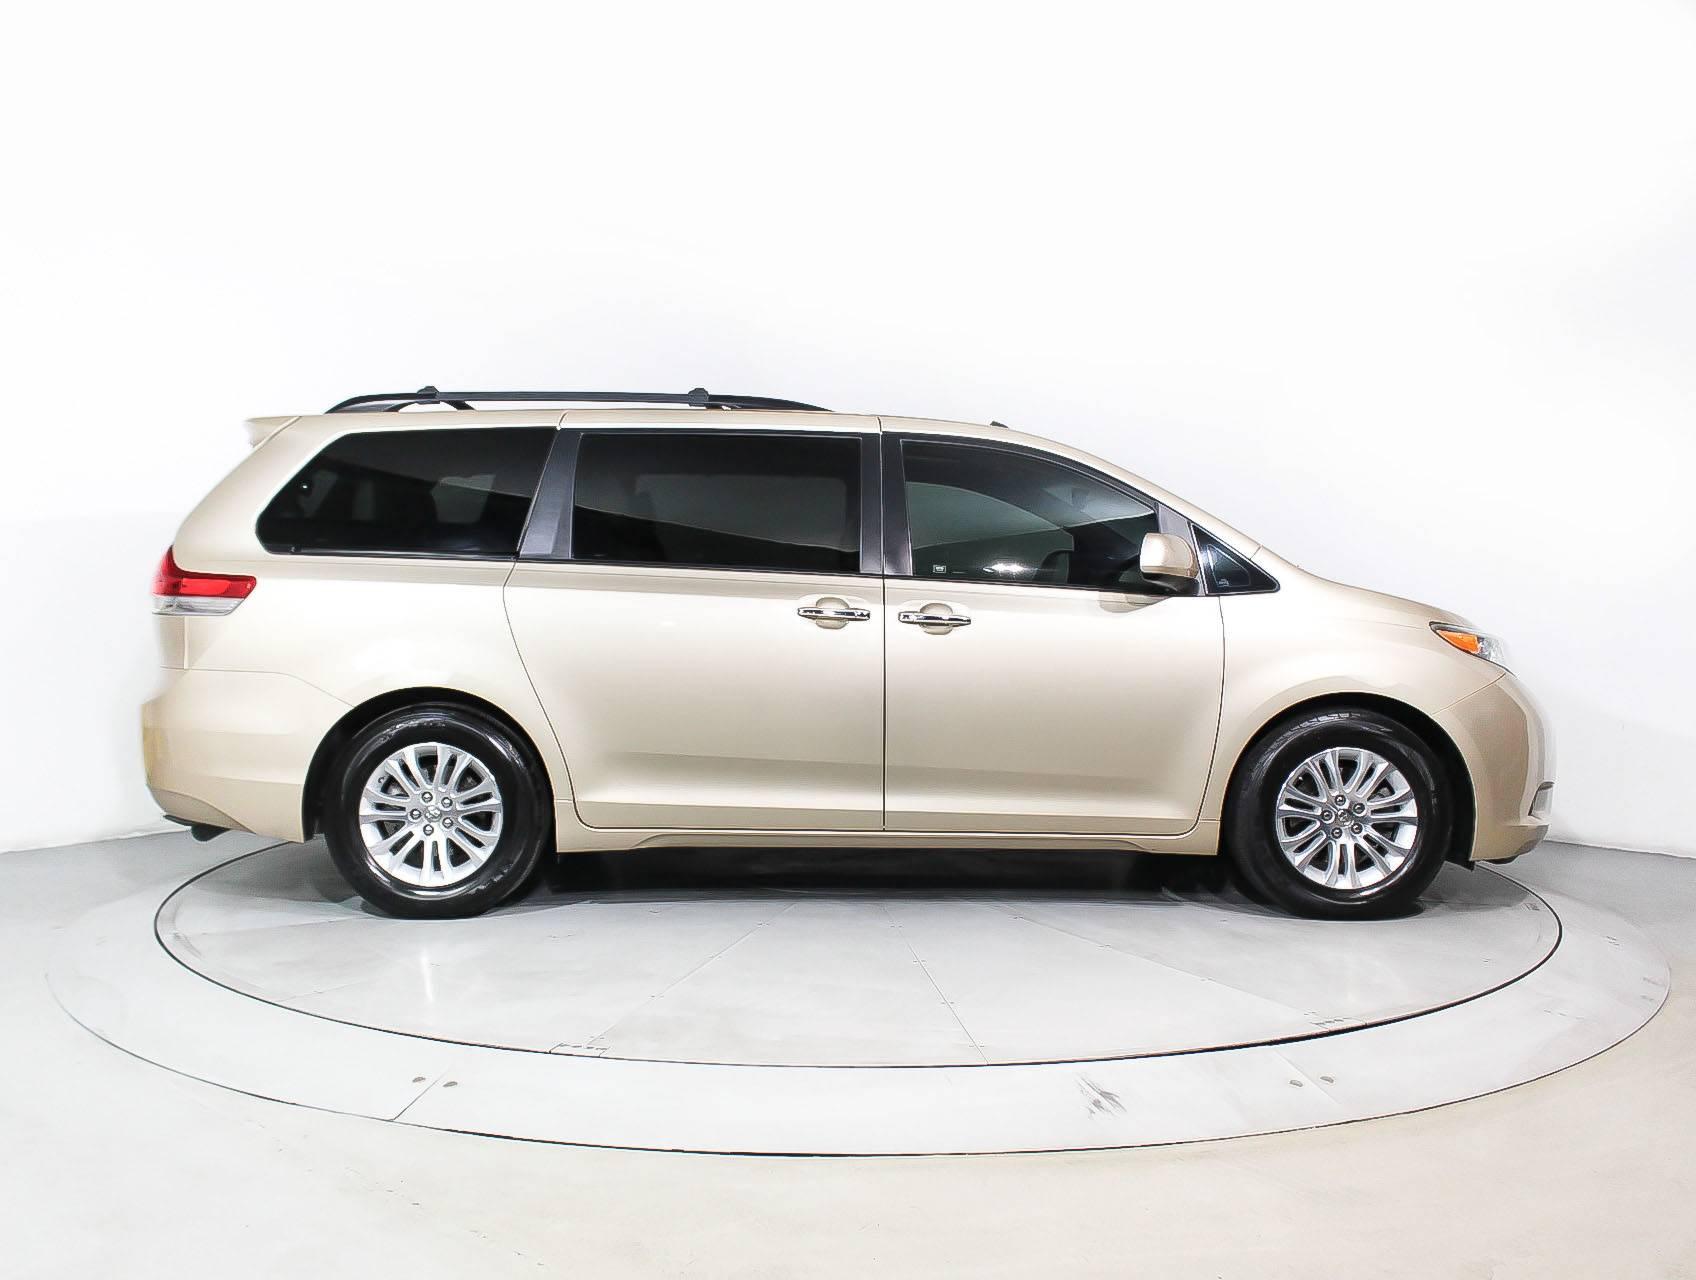 van sienna new sale w mn passenger toyota paul for saint used brand slash xle seating tires